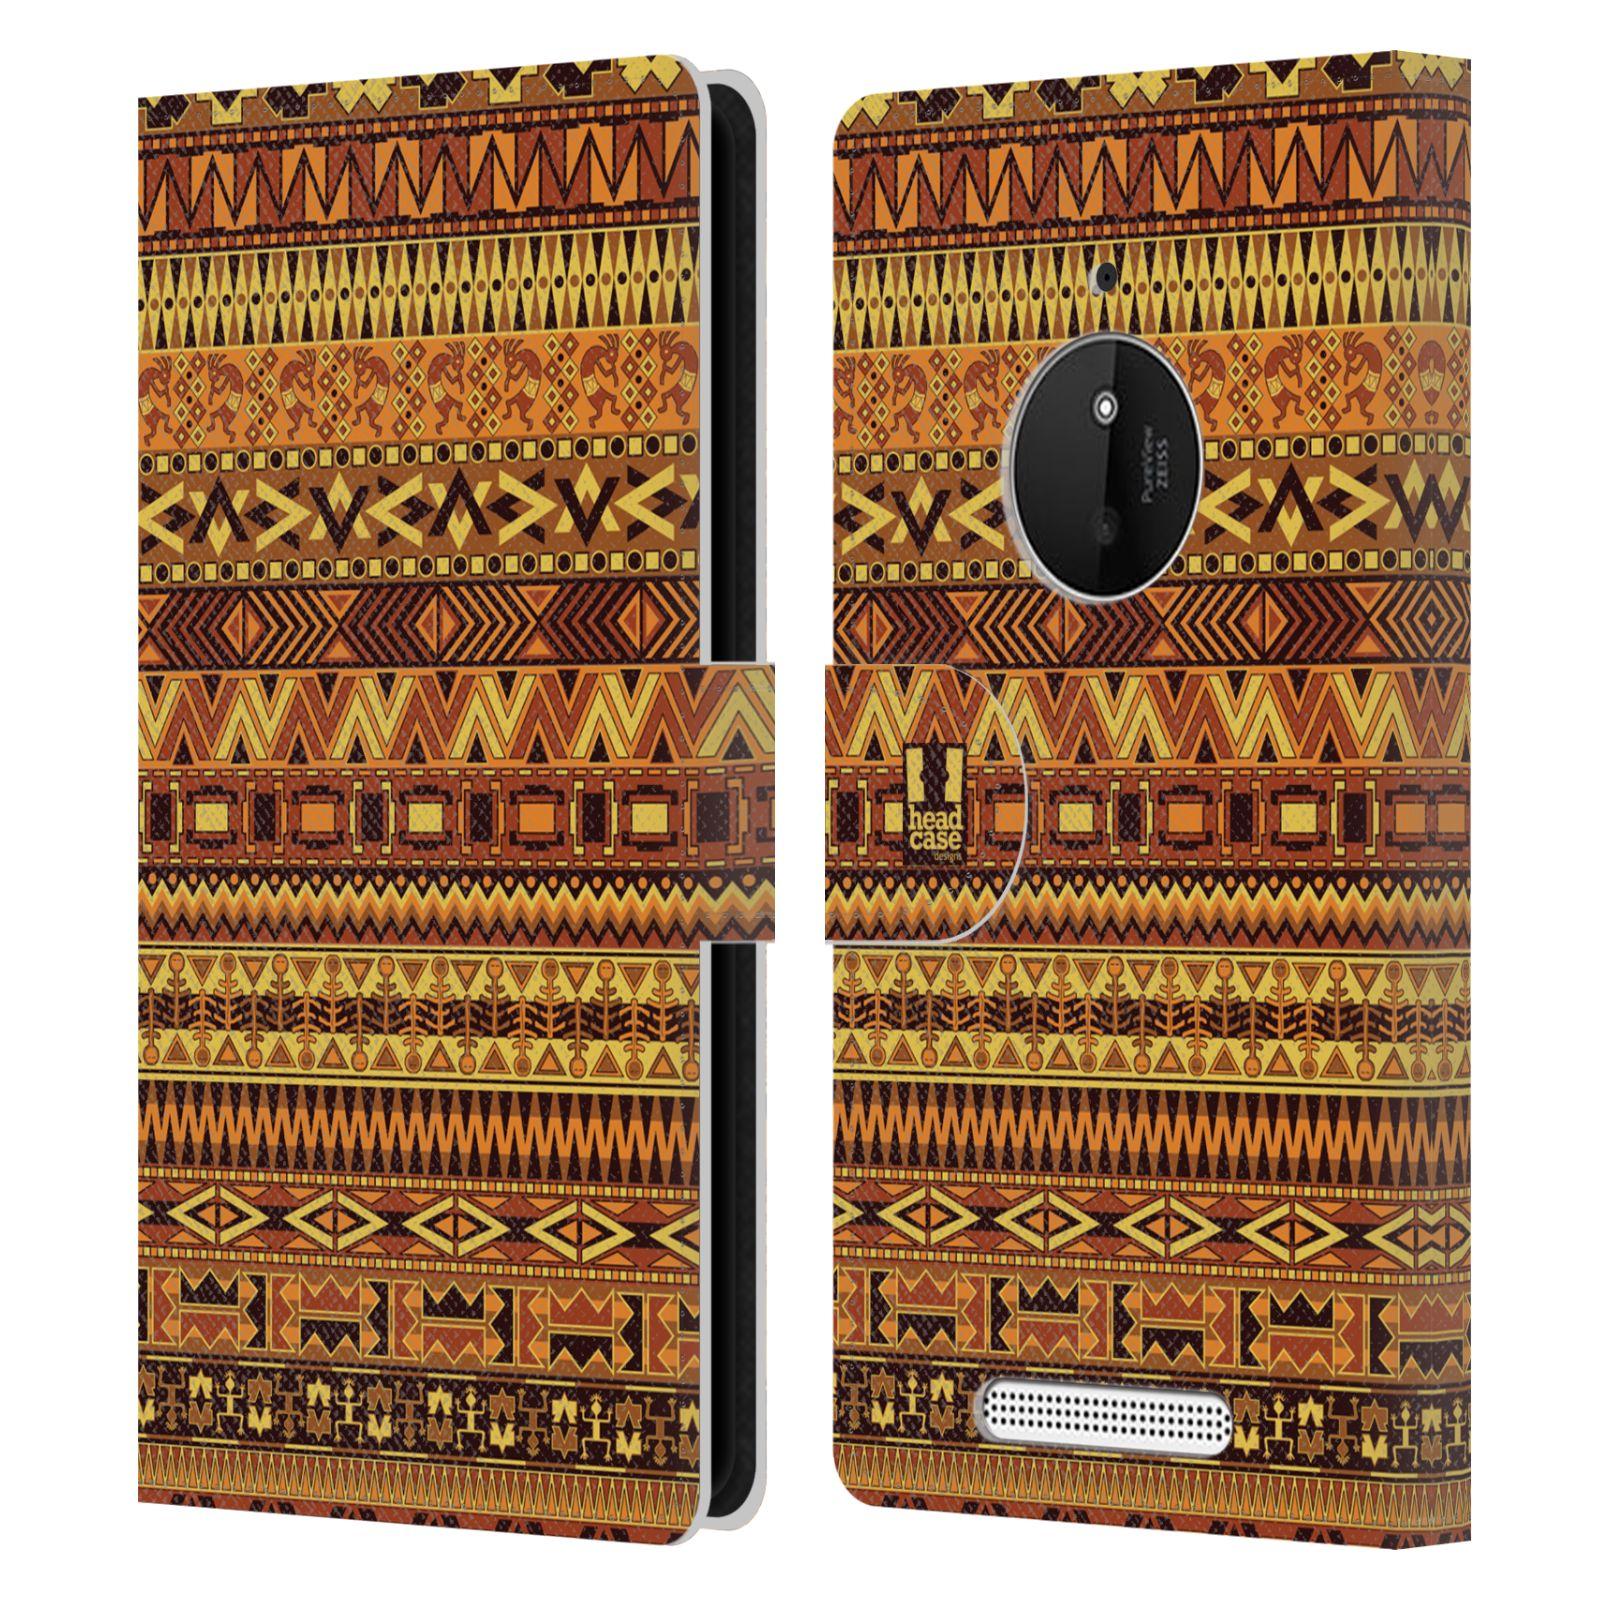 HEAD CASE Flipové pouzdro pro mobil NOKIA LUMIA 830 Indiánský vzor YELLOW žlutá